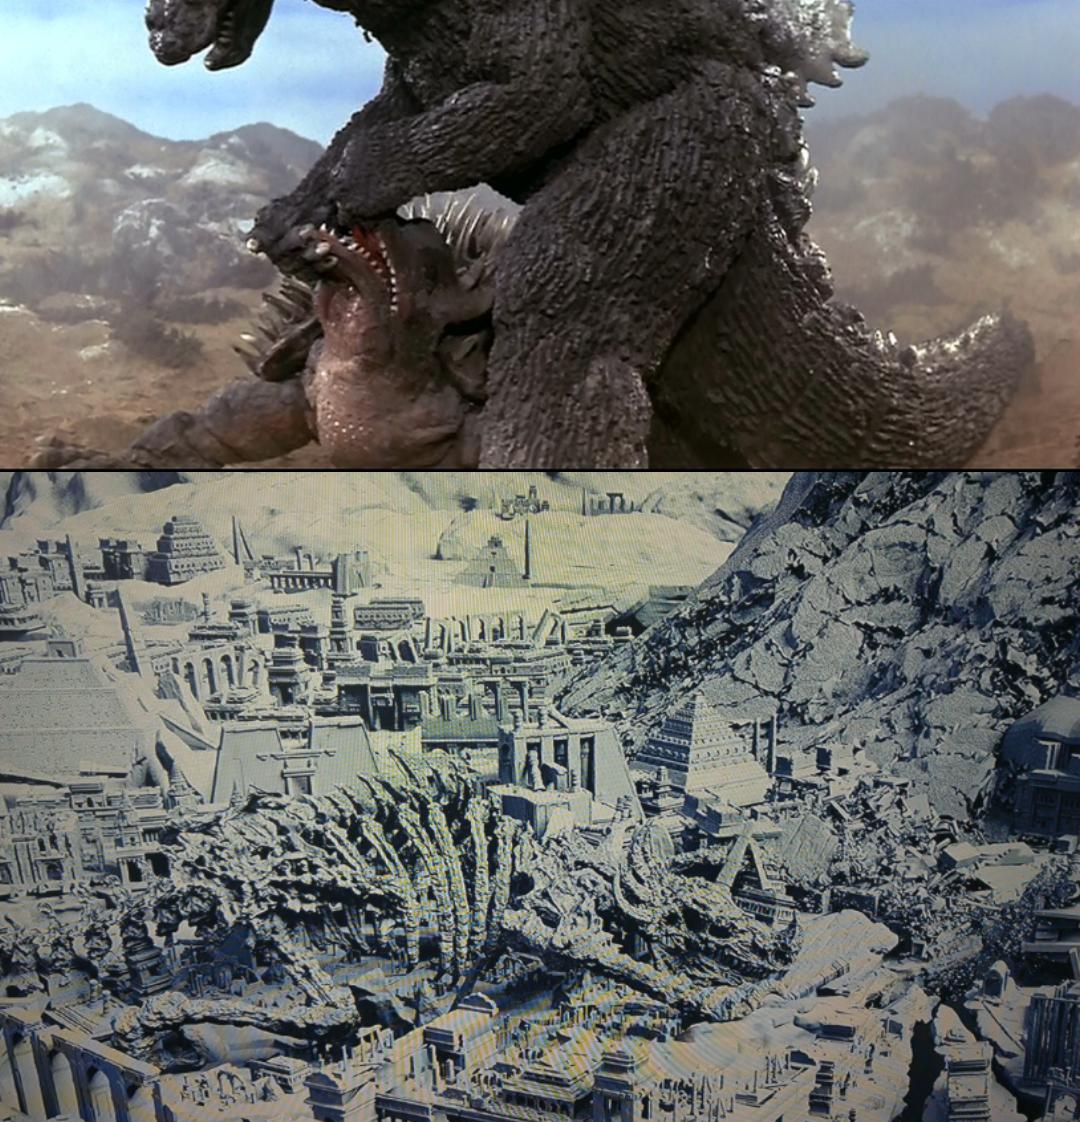 Die Anguirus Legendary theorie